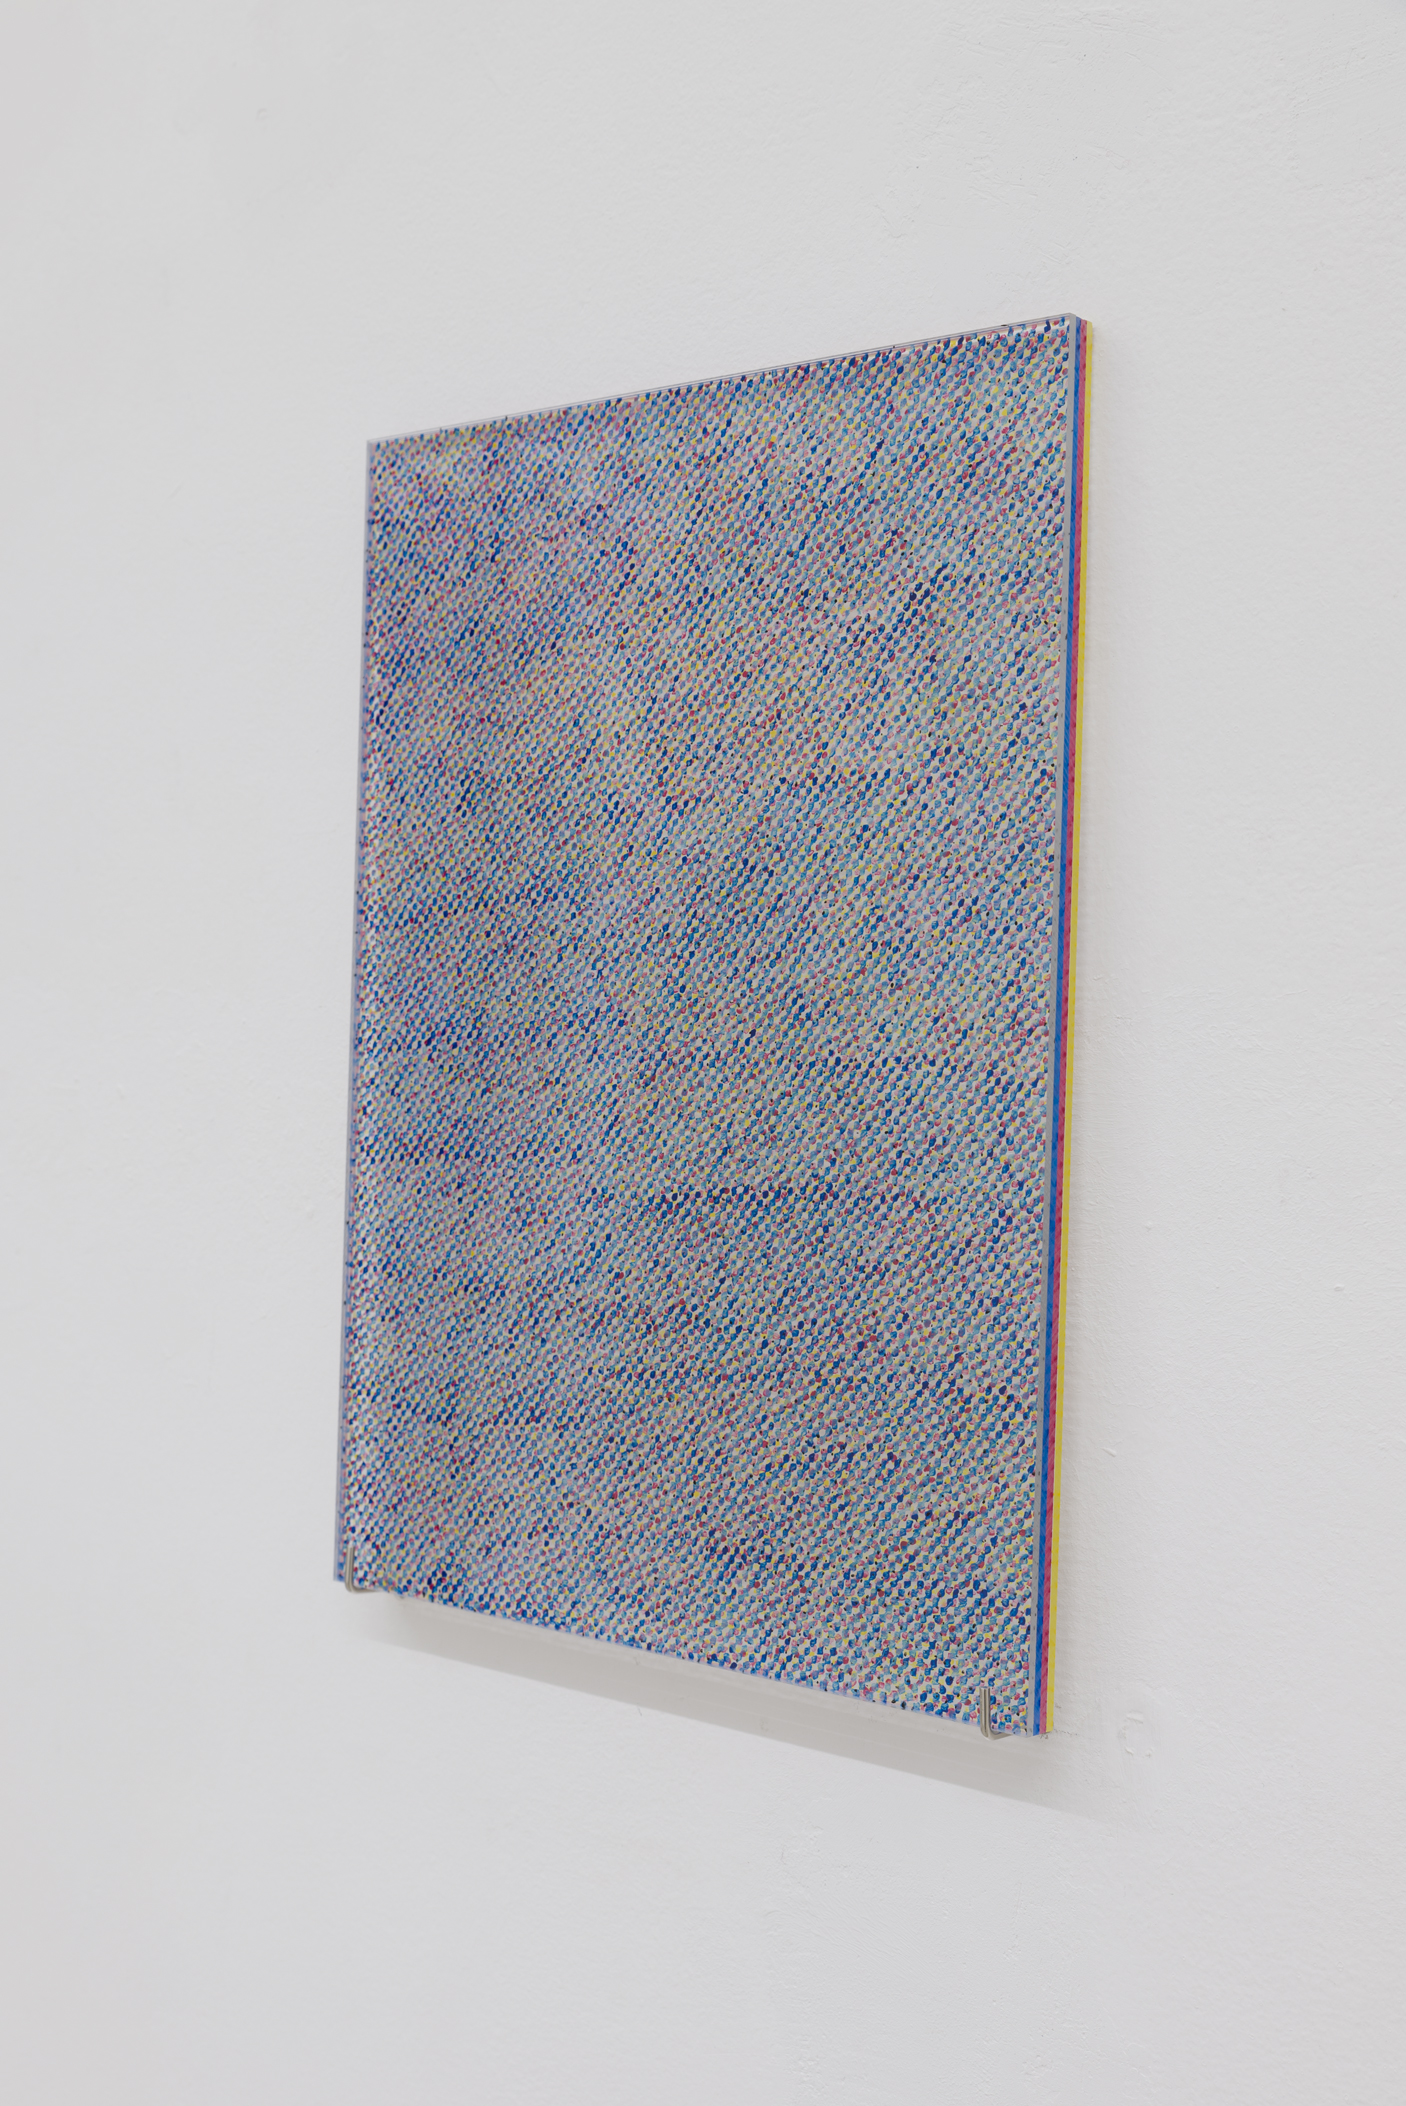 Yuki Higashino, Grey Monochrome 2, Acrylic paint on Plexiglas, 2018